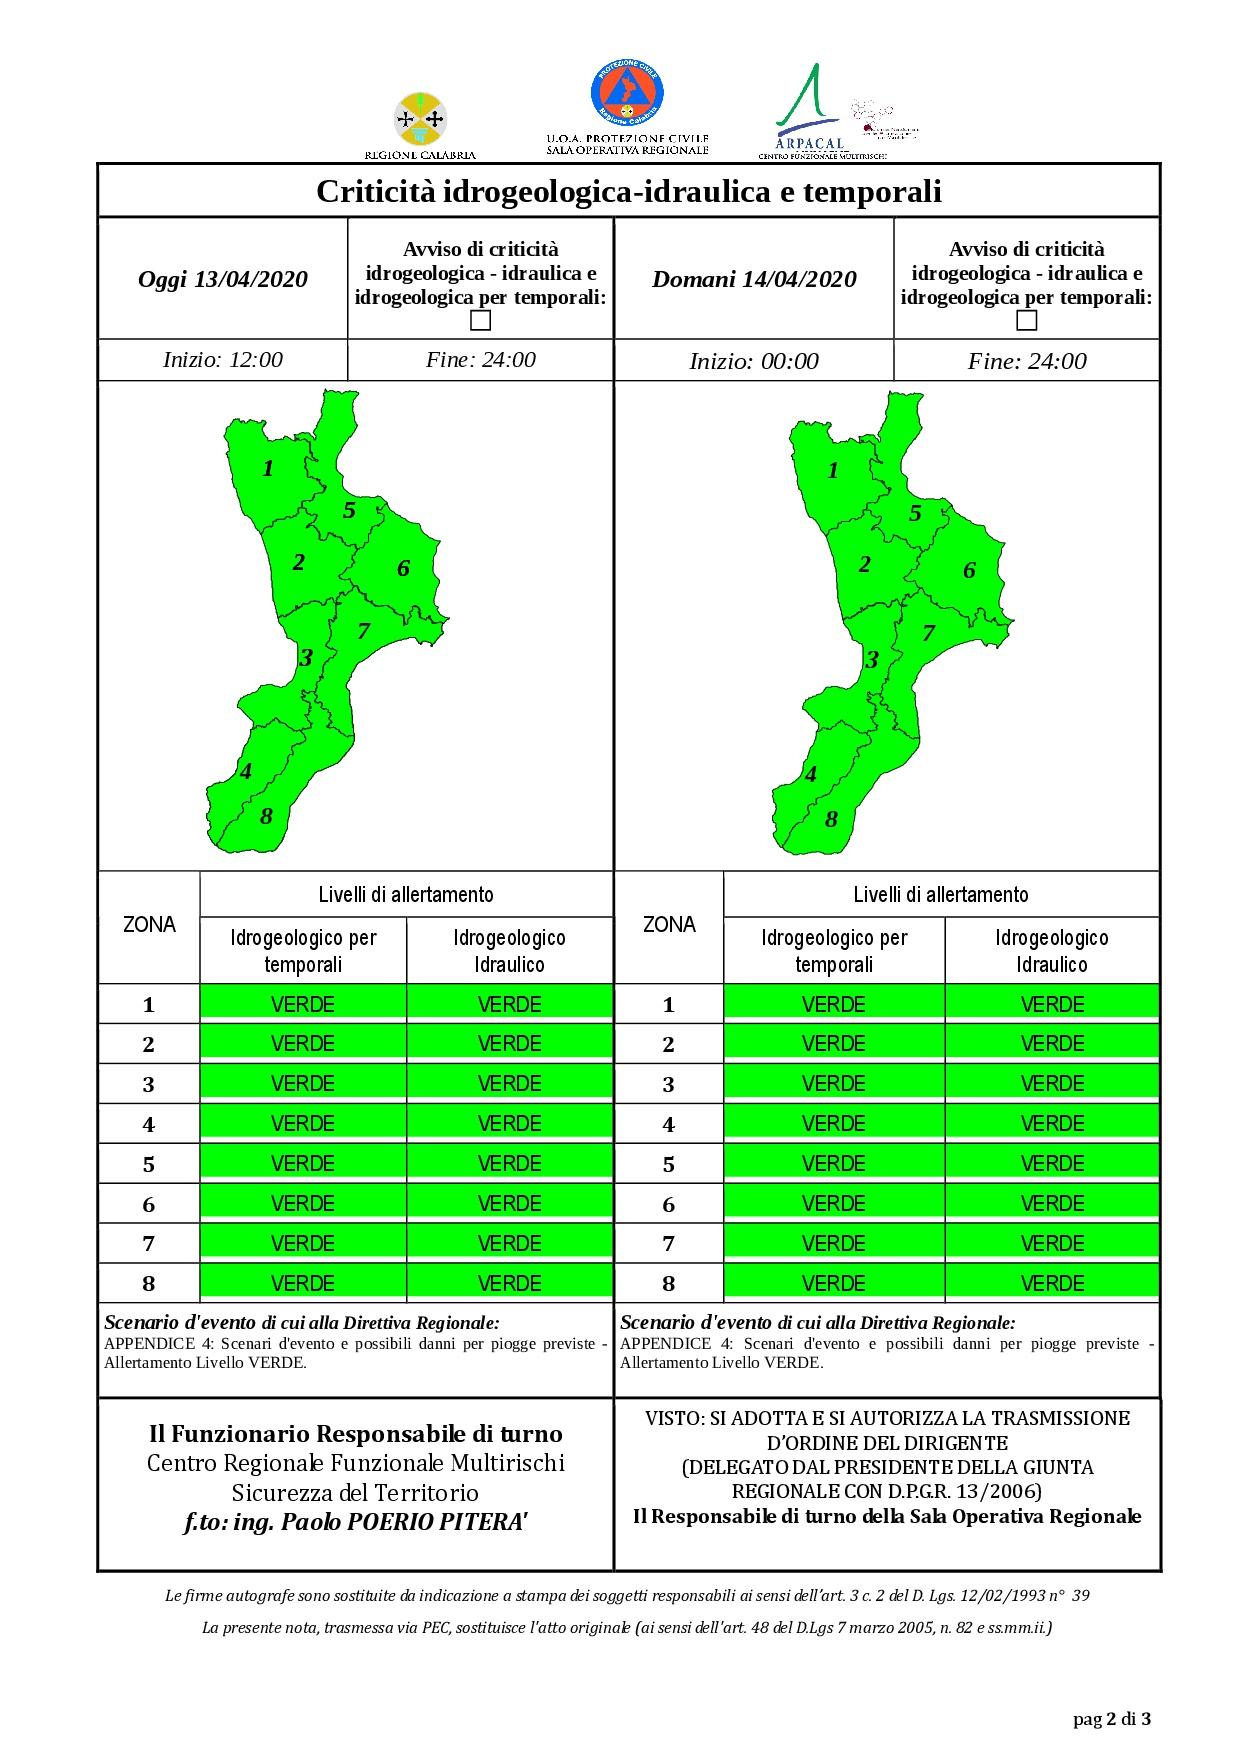 Criticità idrogeologica-idraulica e temporali in Calabria 13-04-2020